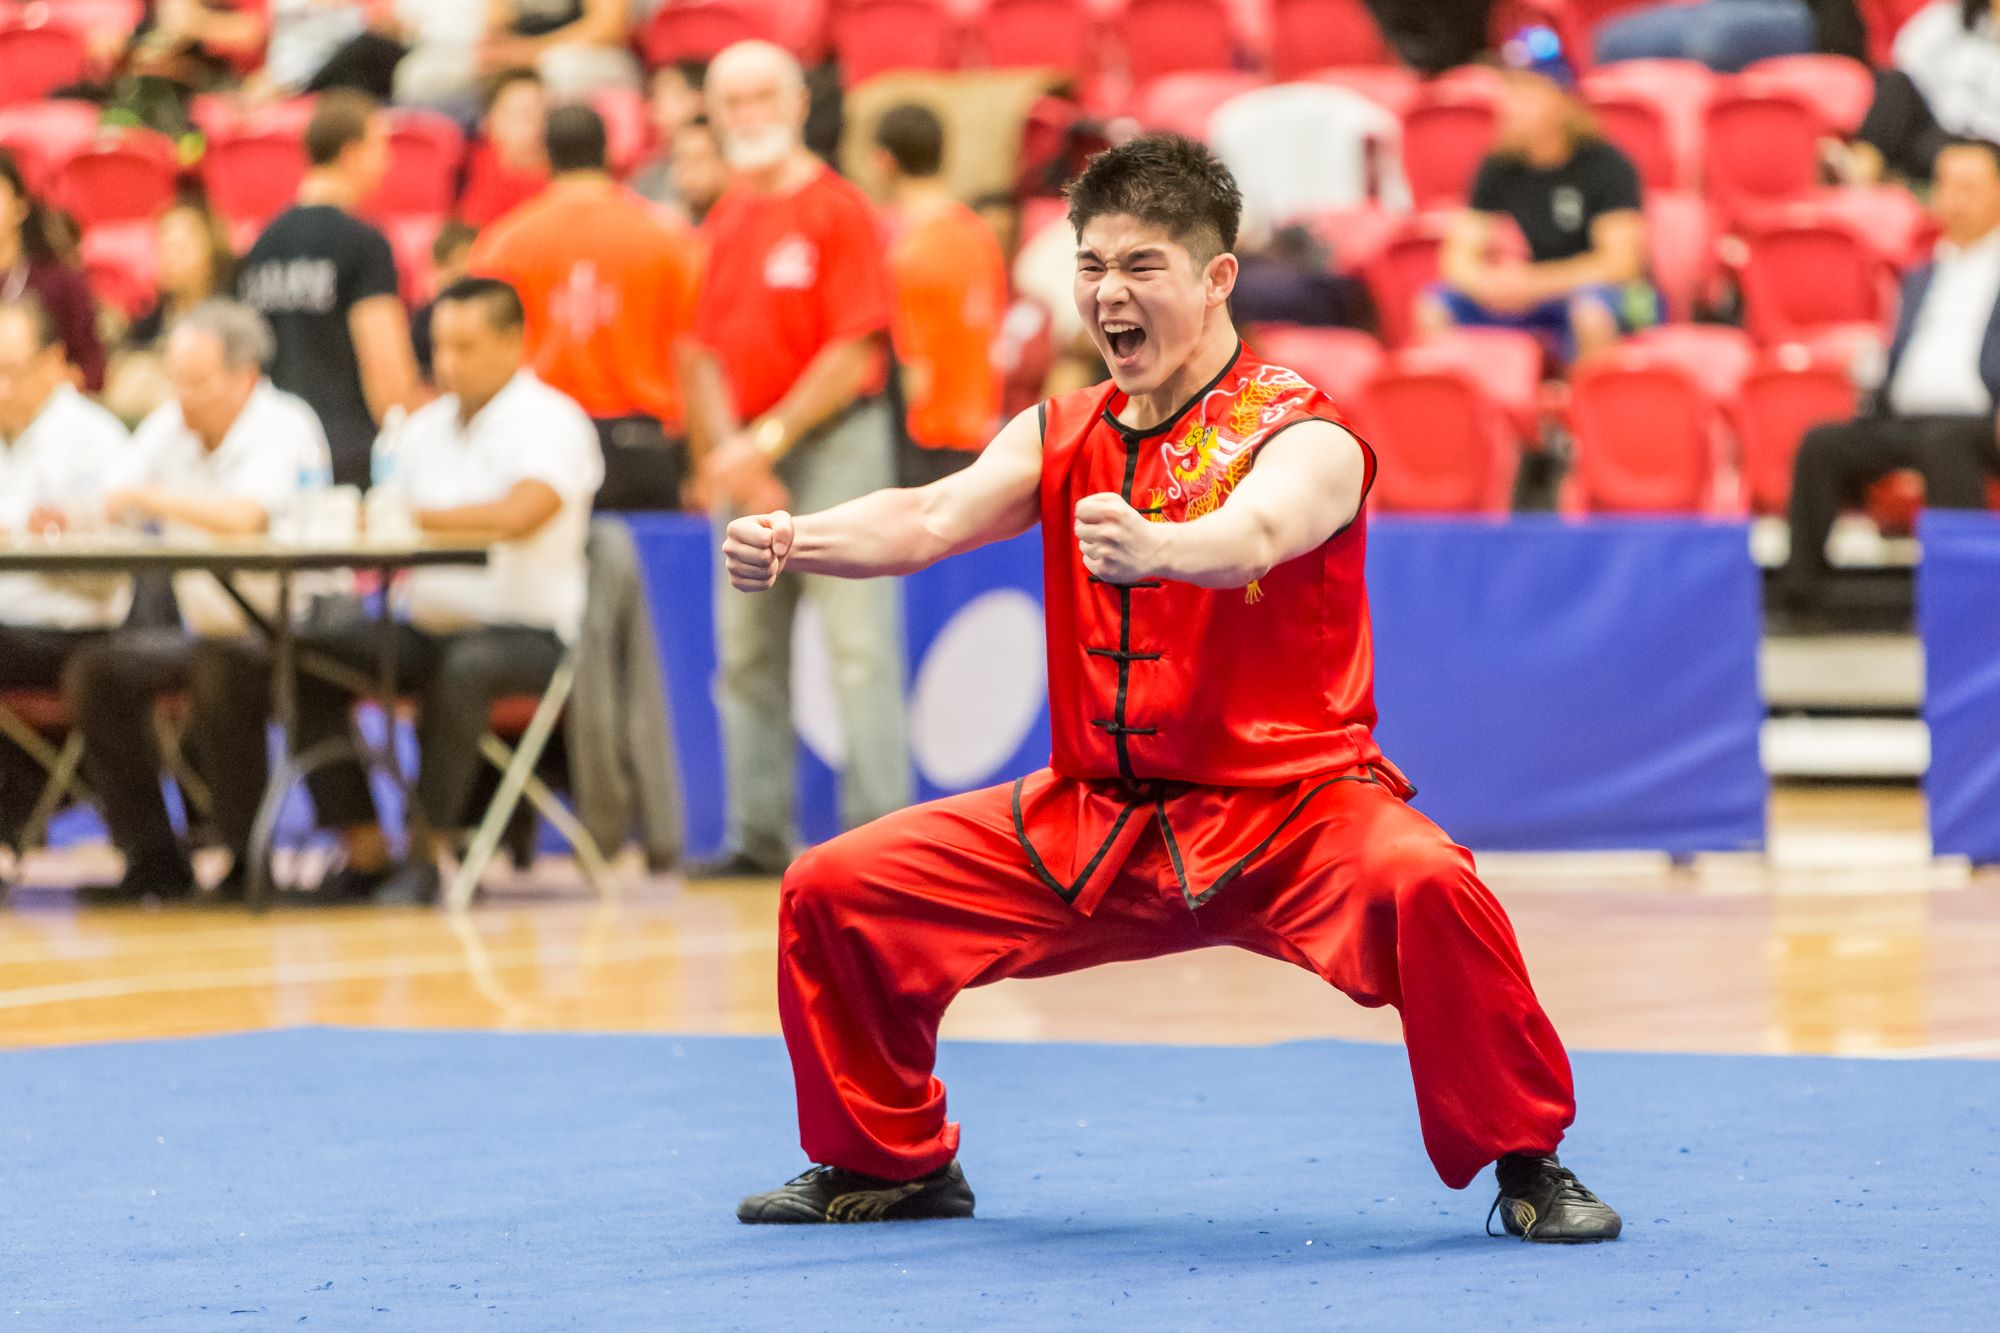 wayland-li-wushu-toronto-markham-canadian-wushu-championships-2017-nanquan-2.jpg